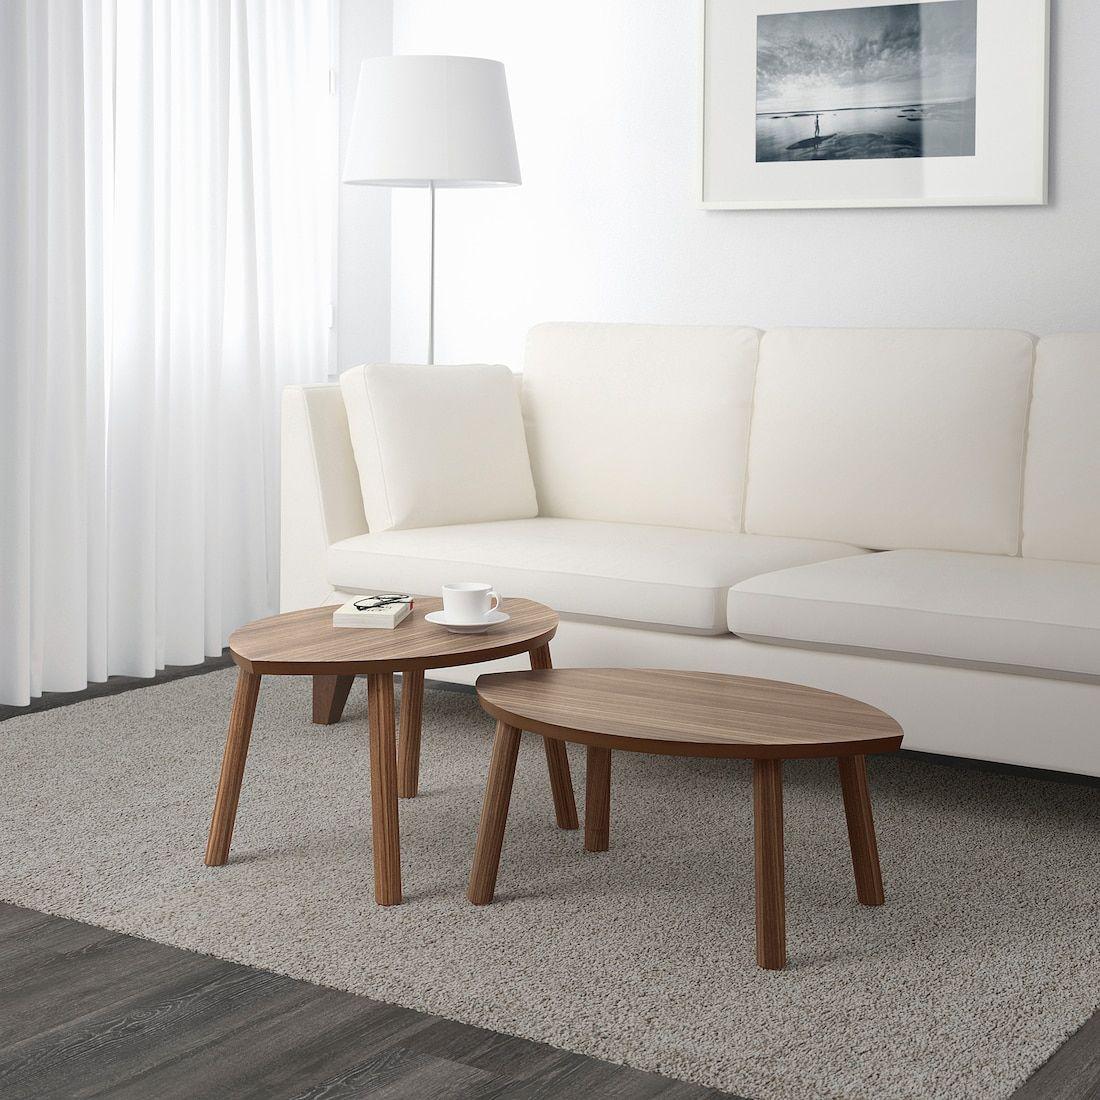 Kragsta Coffee Table Black 90 Cm Ikea Ireland Ikea Coffee Table Coffee Table White Coffee Table [ 1000 x 1000 Pixel ]